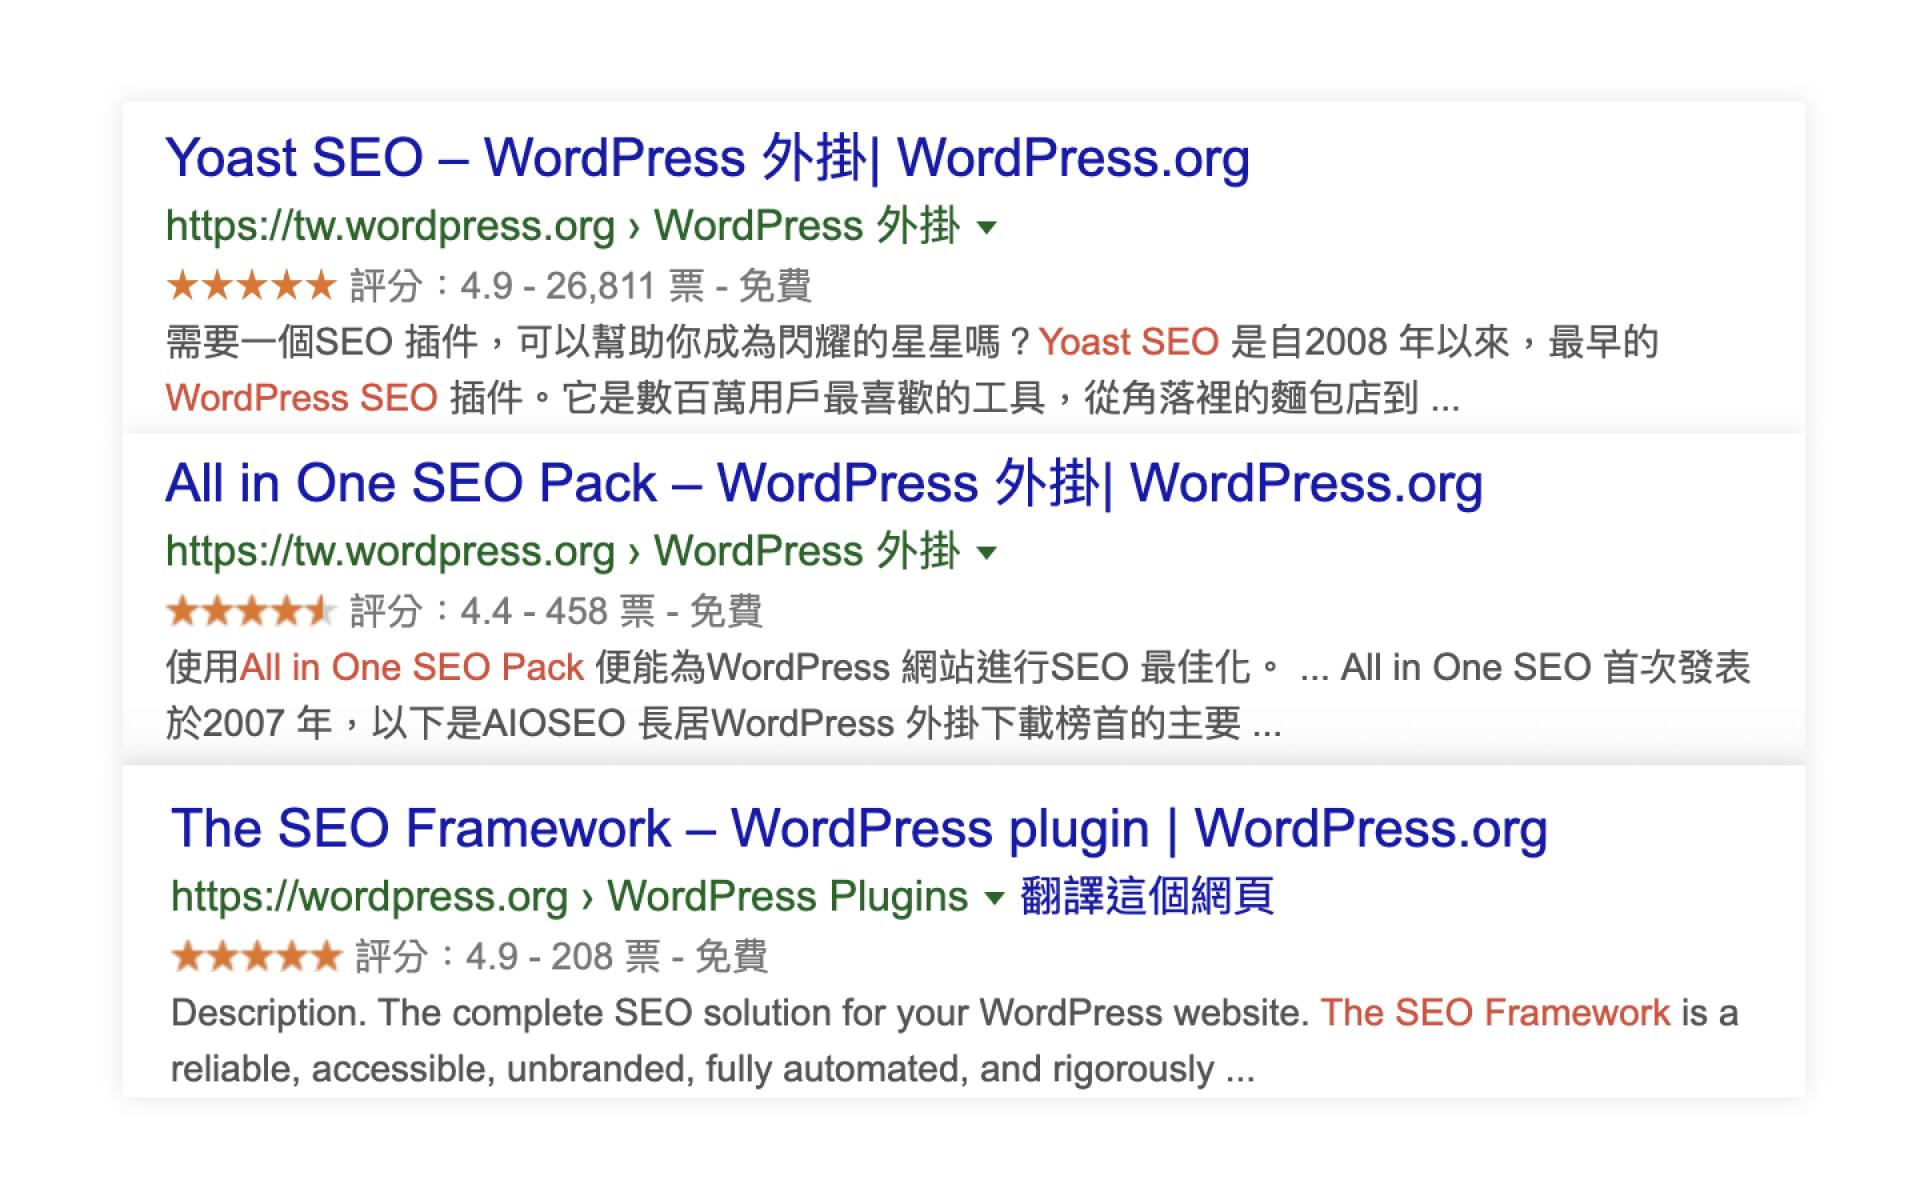 WordPress SEO plugins-Yoast vs. The SEO Framework vs All in One SEO-IrvingLab 爾文實驗室